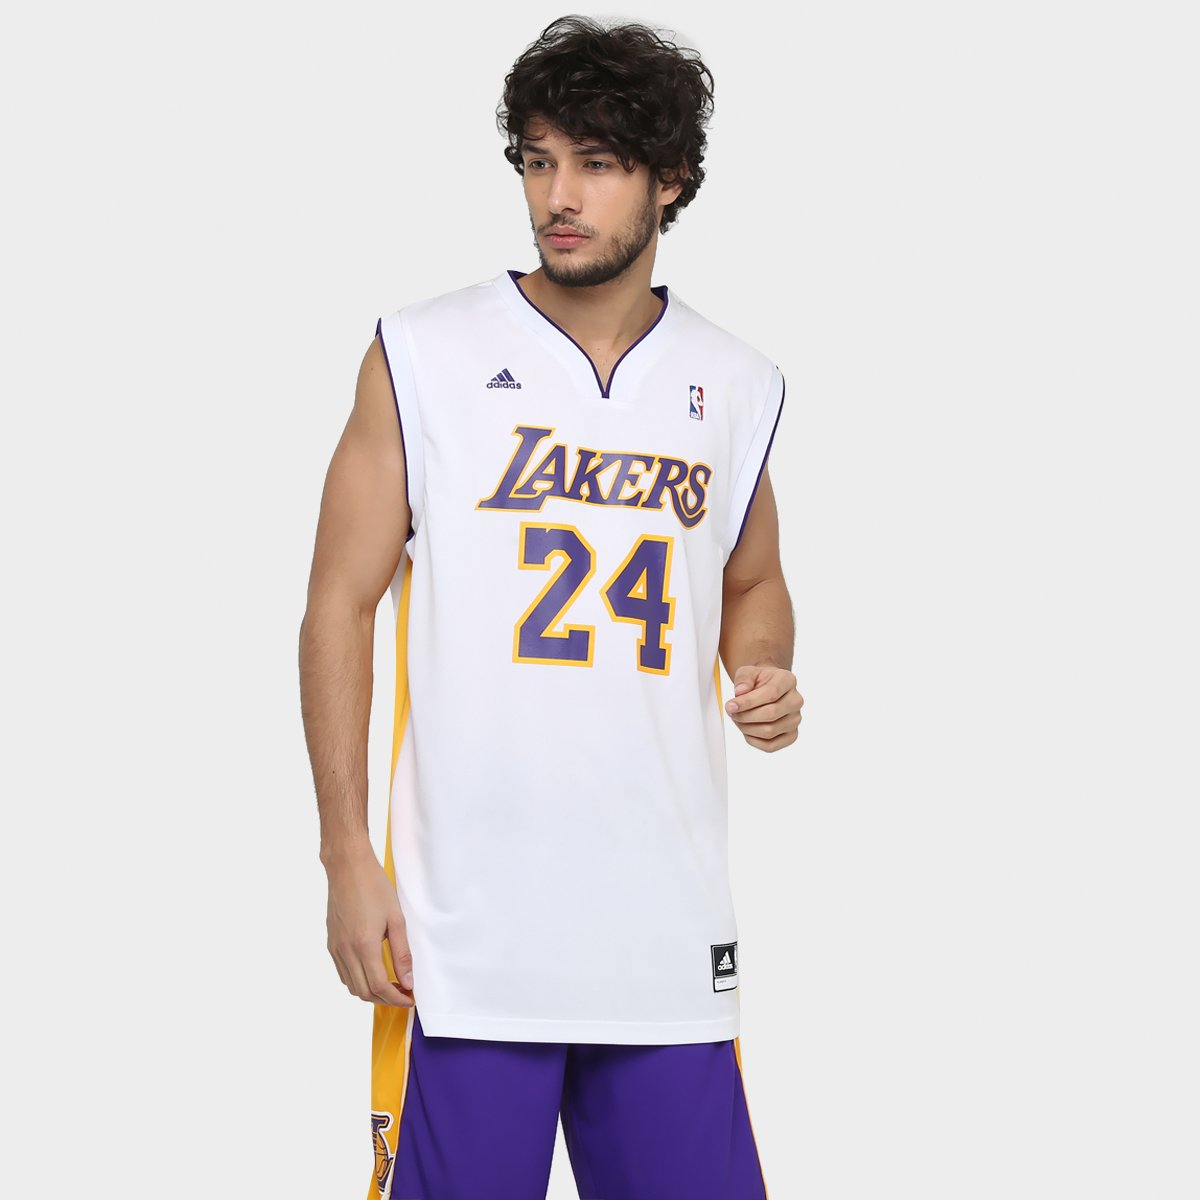 3f6b43fc0 Camiseta Regata Adidas Los Angeles Lakers Alt Bryant - Compre Agora ...